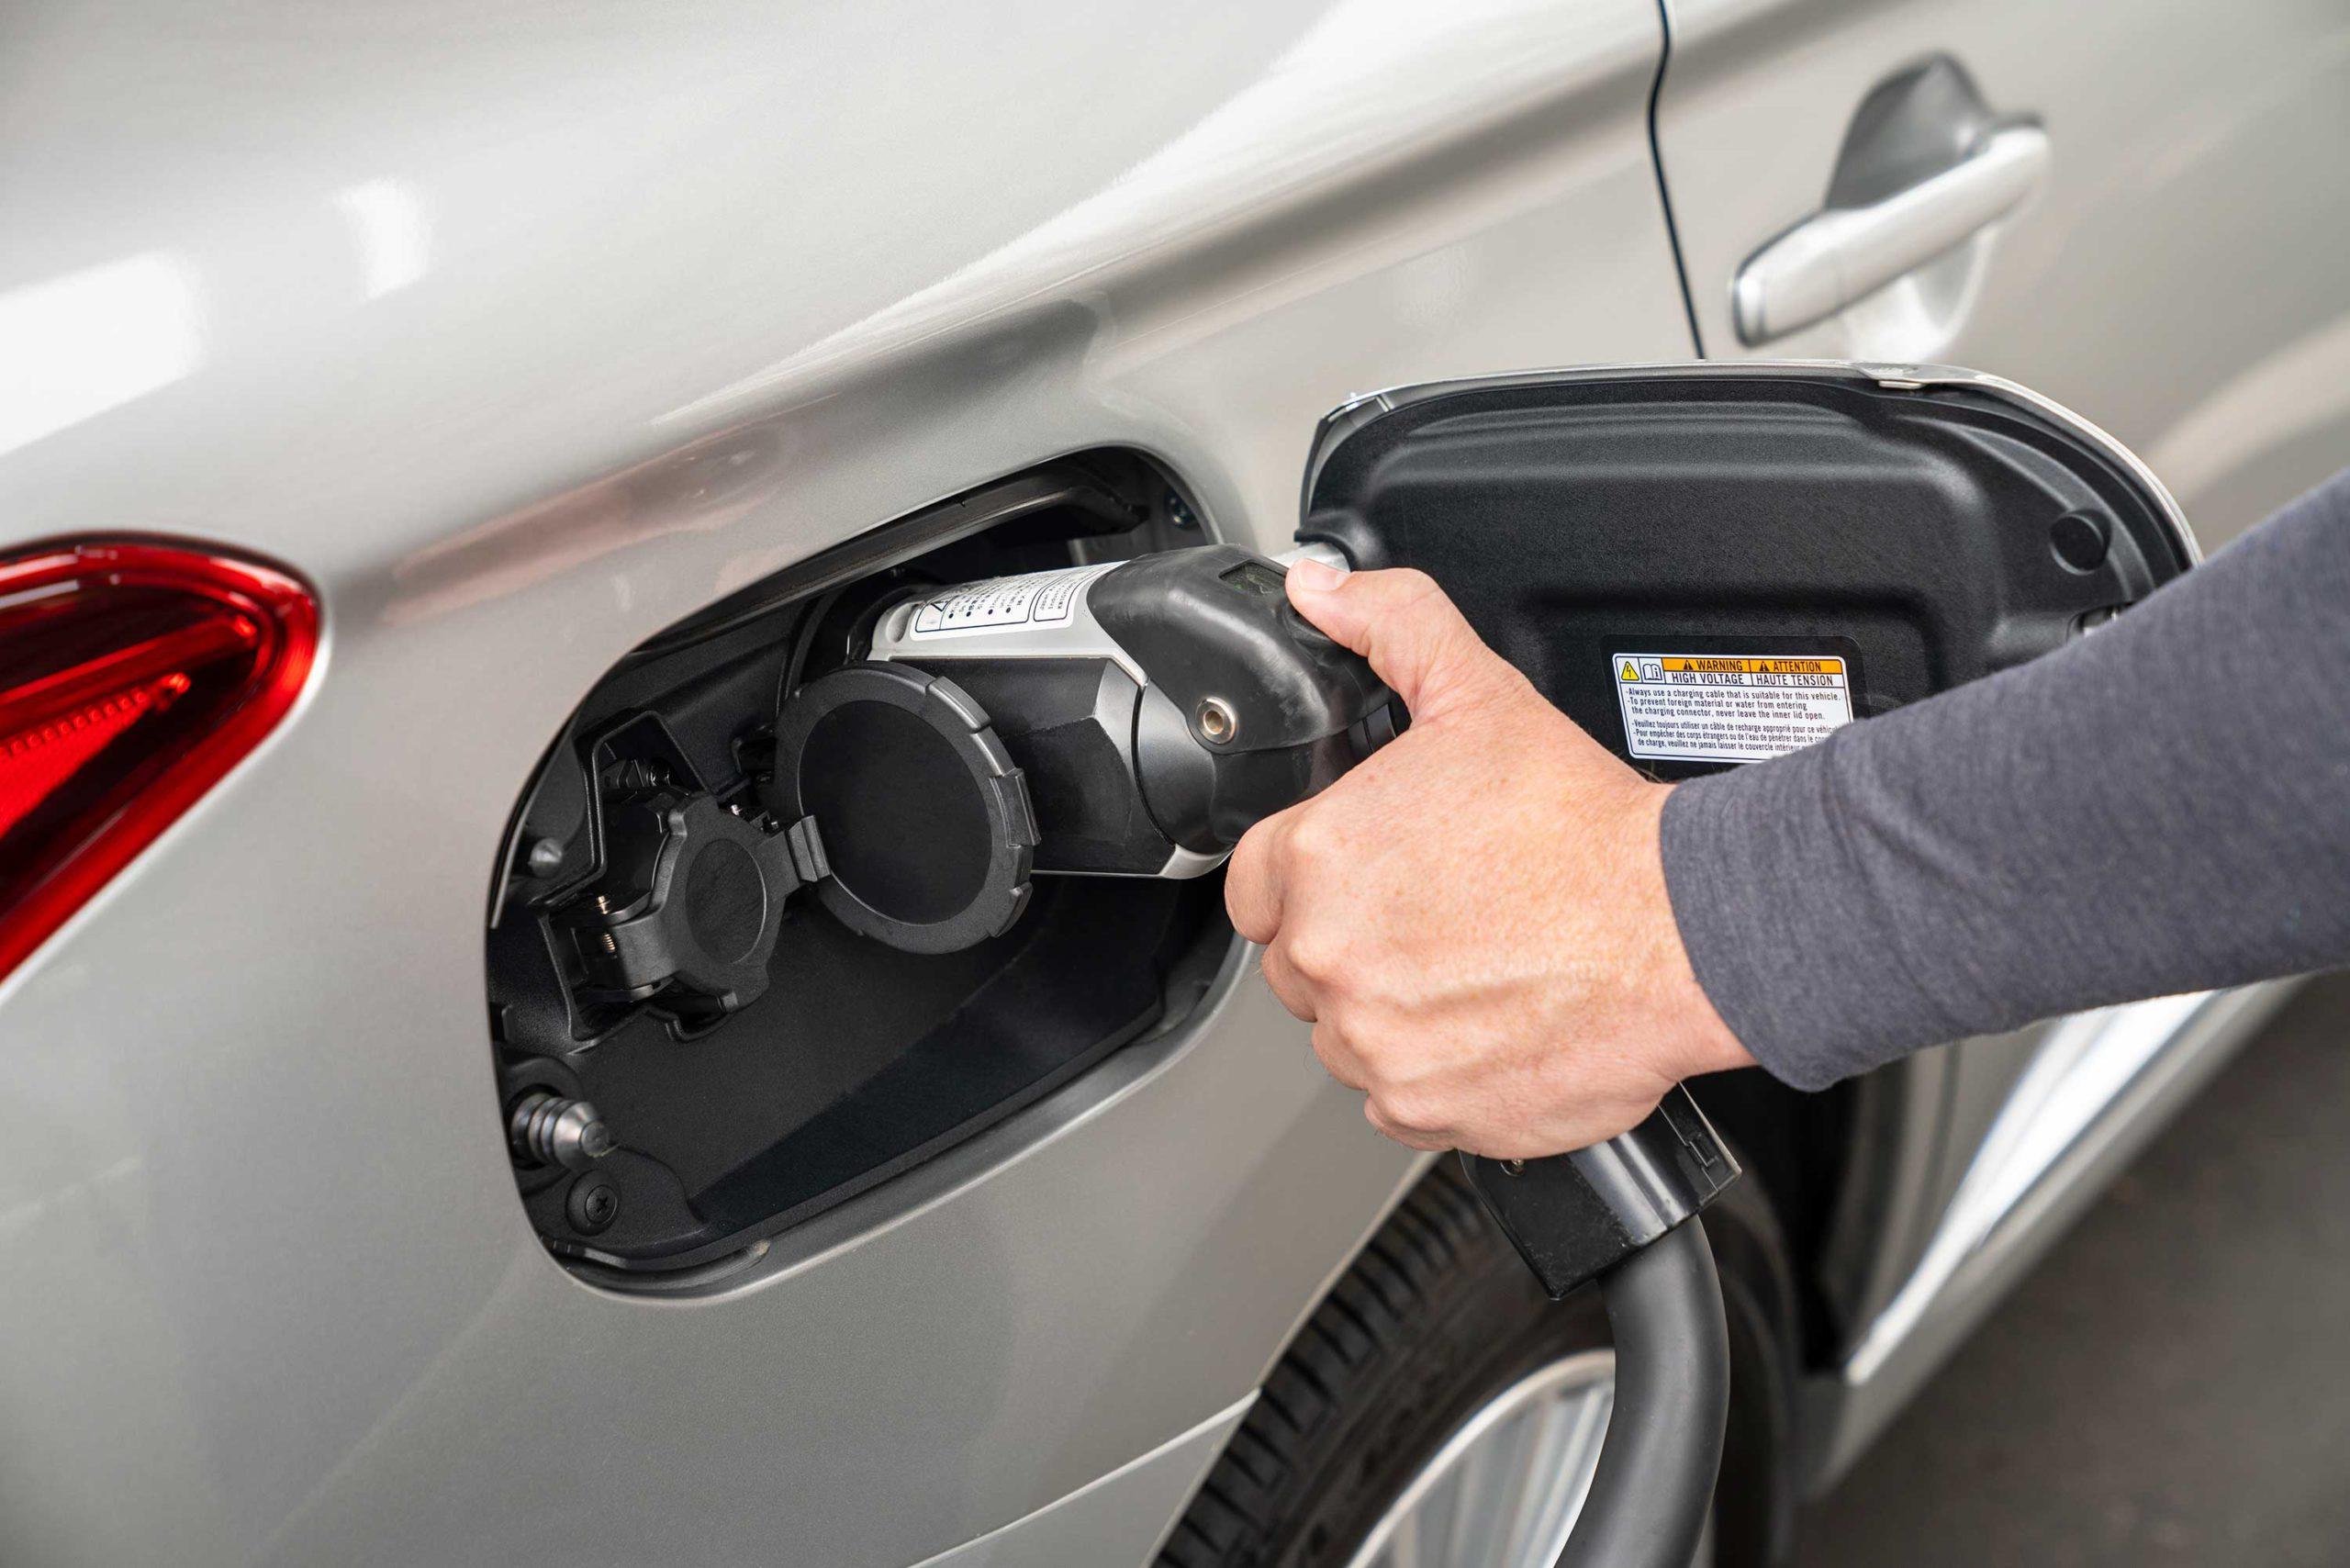 2021 Mitsubishi Outlander PHEV charging ports